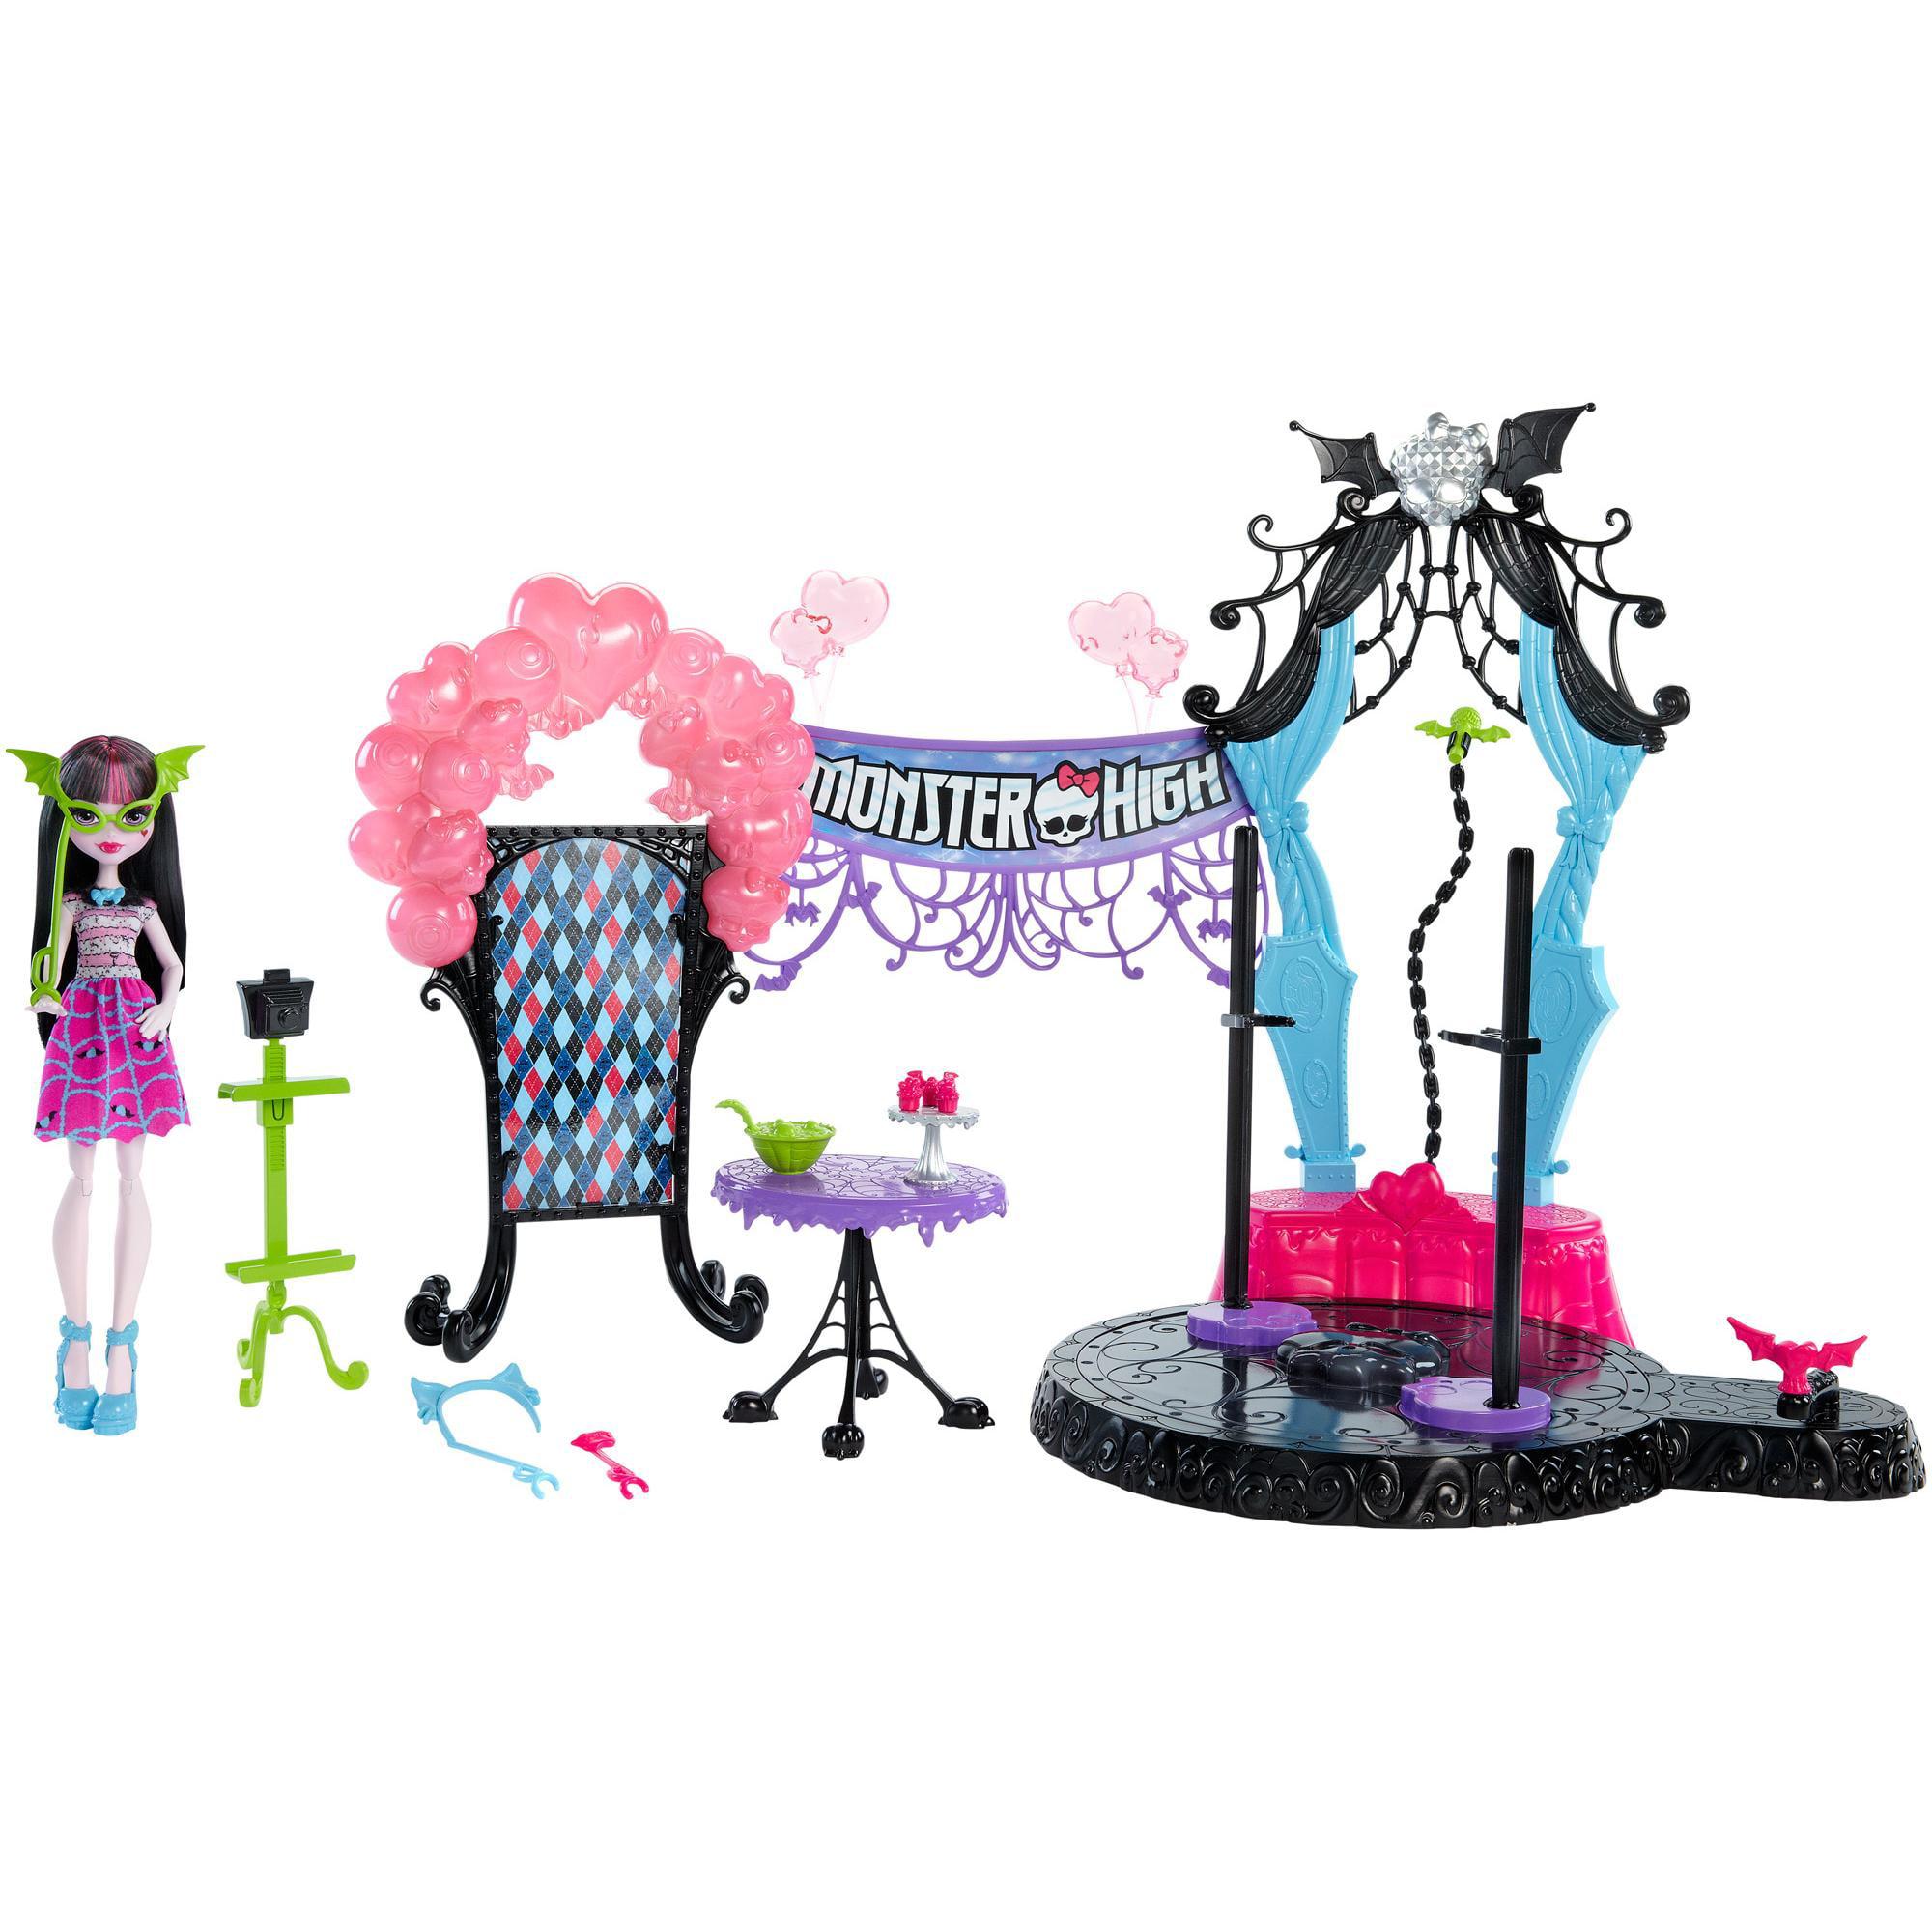 Monster High Fright Away Entertainment Playset by MATTEL INC.